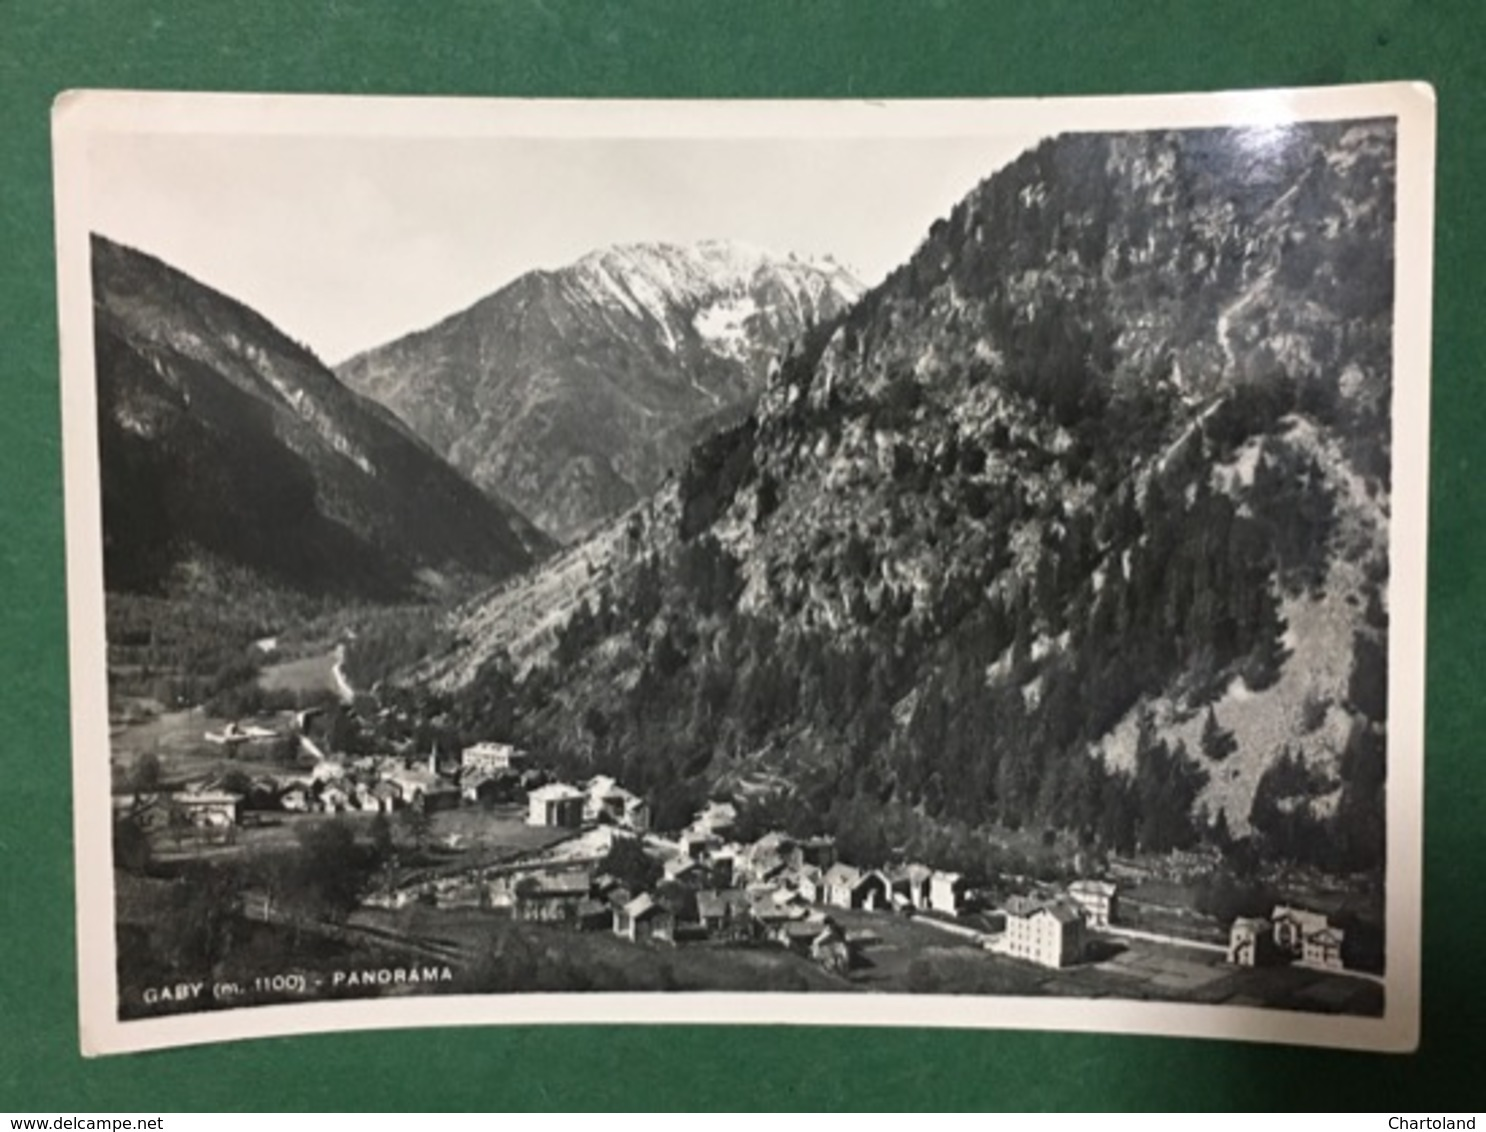 Cartolina Gaby - Panorama - 1952 - Italien